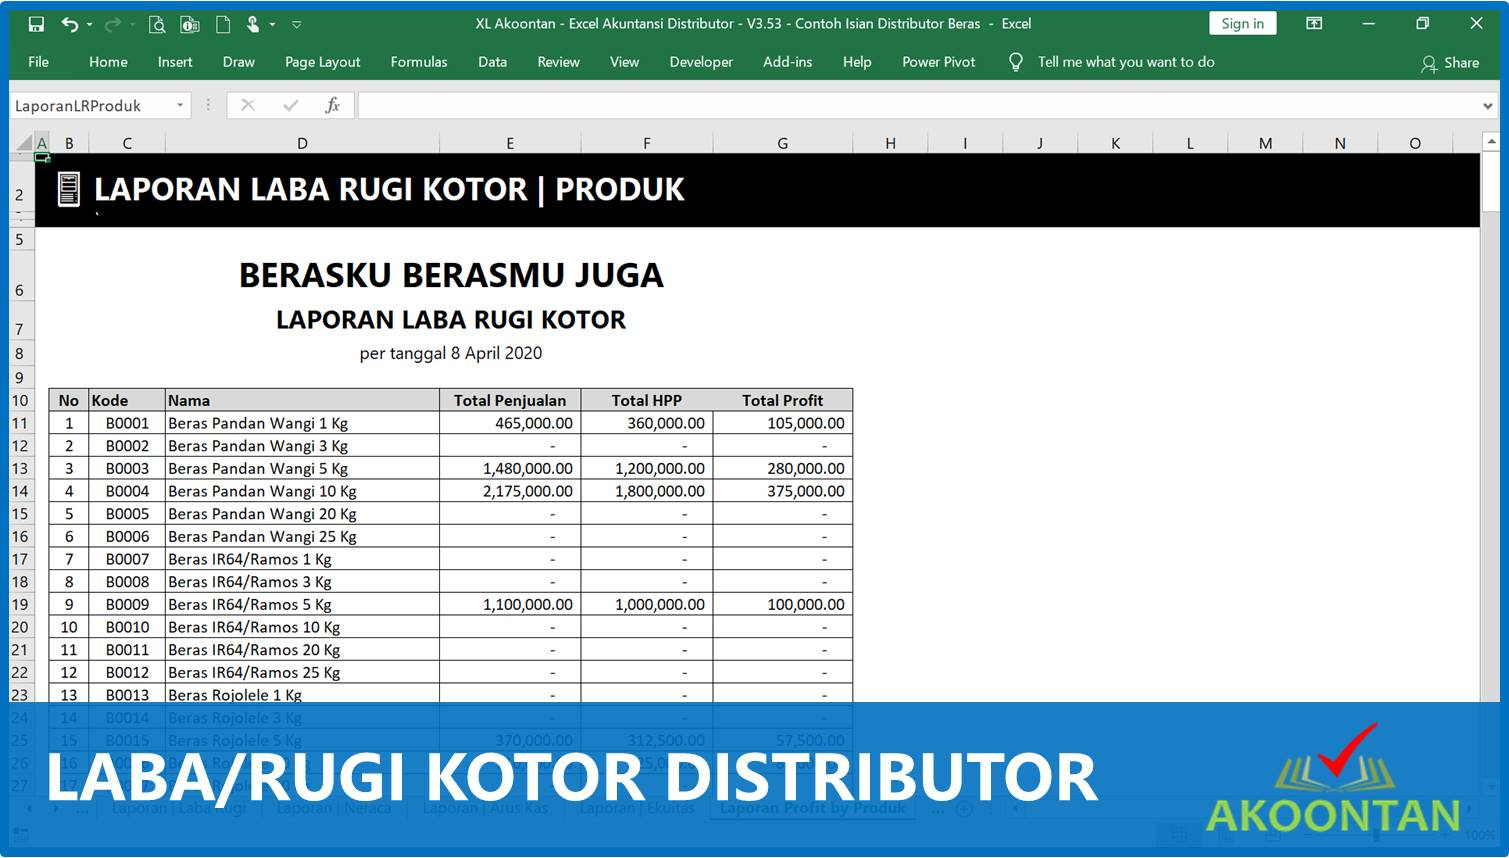 Laporan Laba Rugi Distributor - Akuntansi-ID